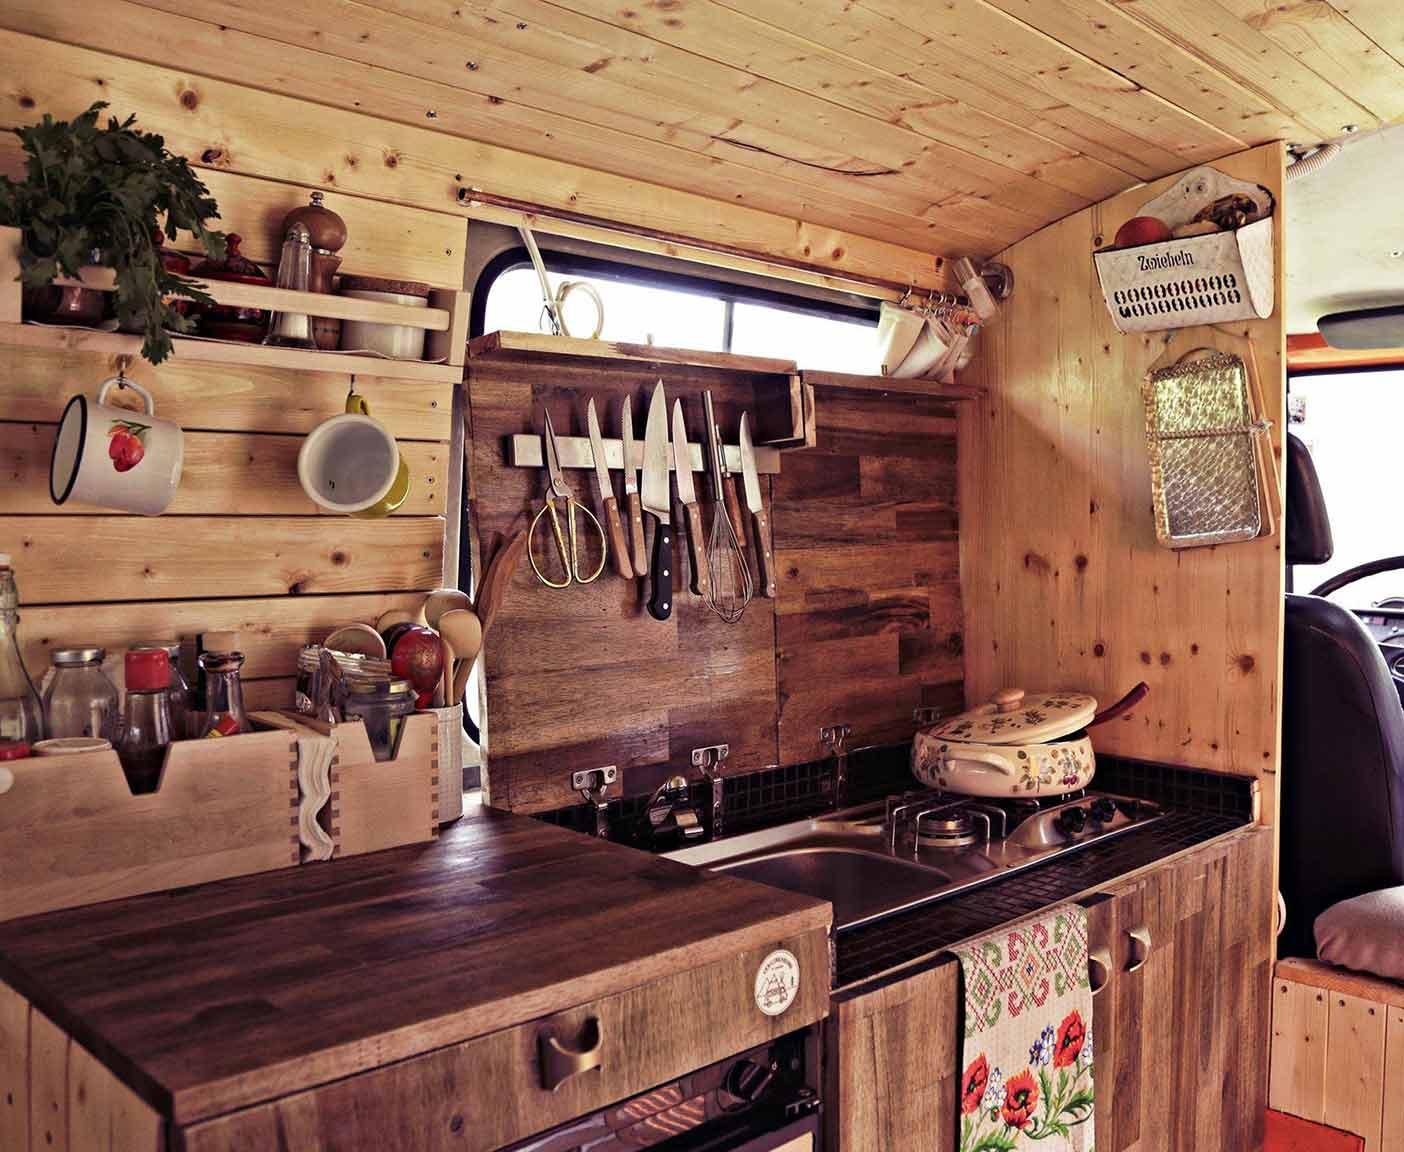 wohnmobil-kueche-ausbau-camper-ausbauten-selbstausbau-campingbus-guide